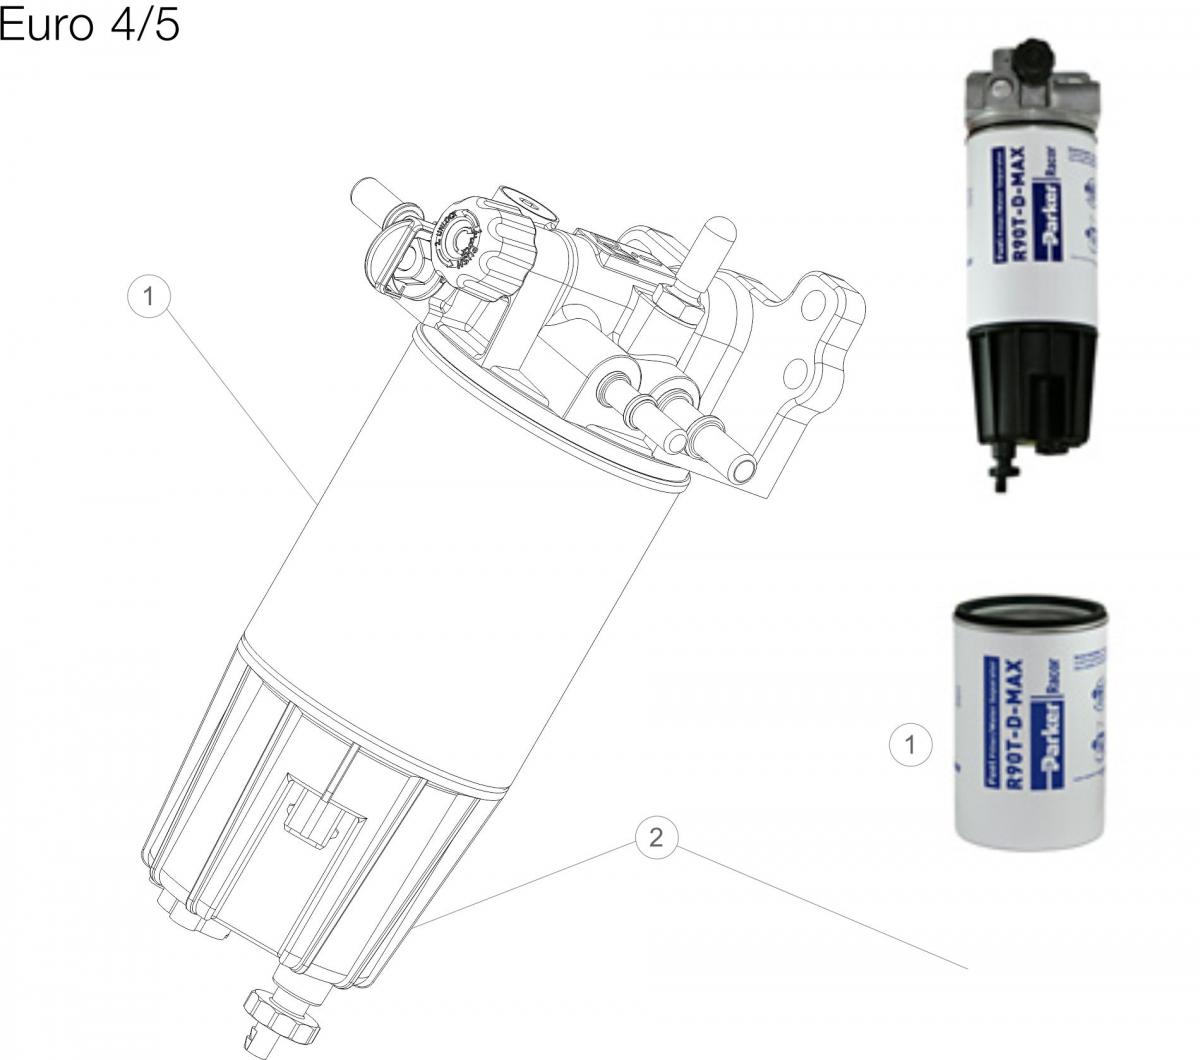 +Parker+Racor+Filtr+paliwa+renault+euro+4+5+